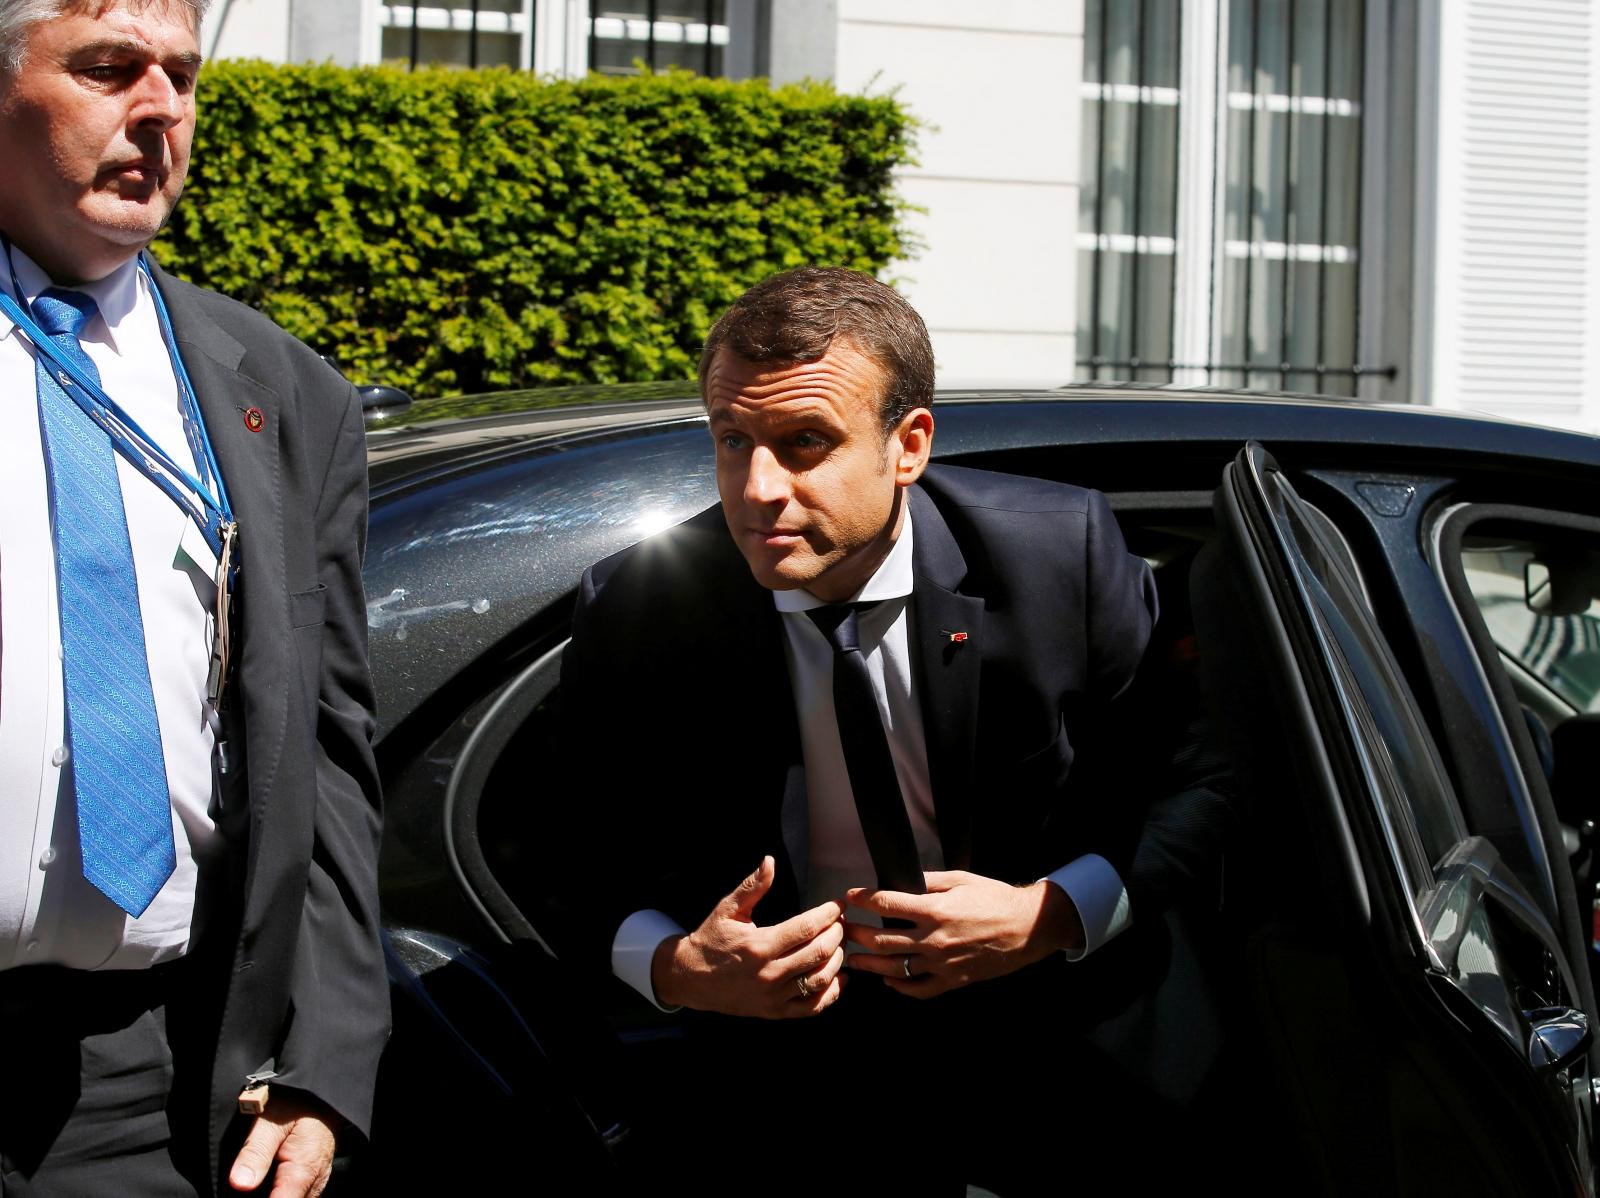 Vladimir Putin France visit